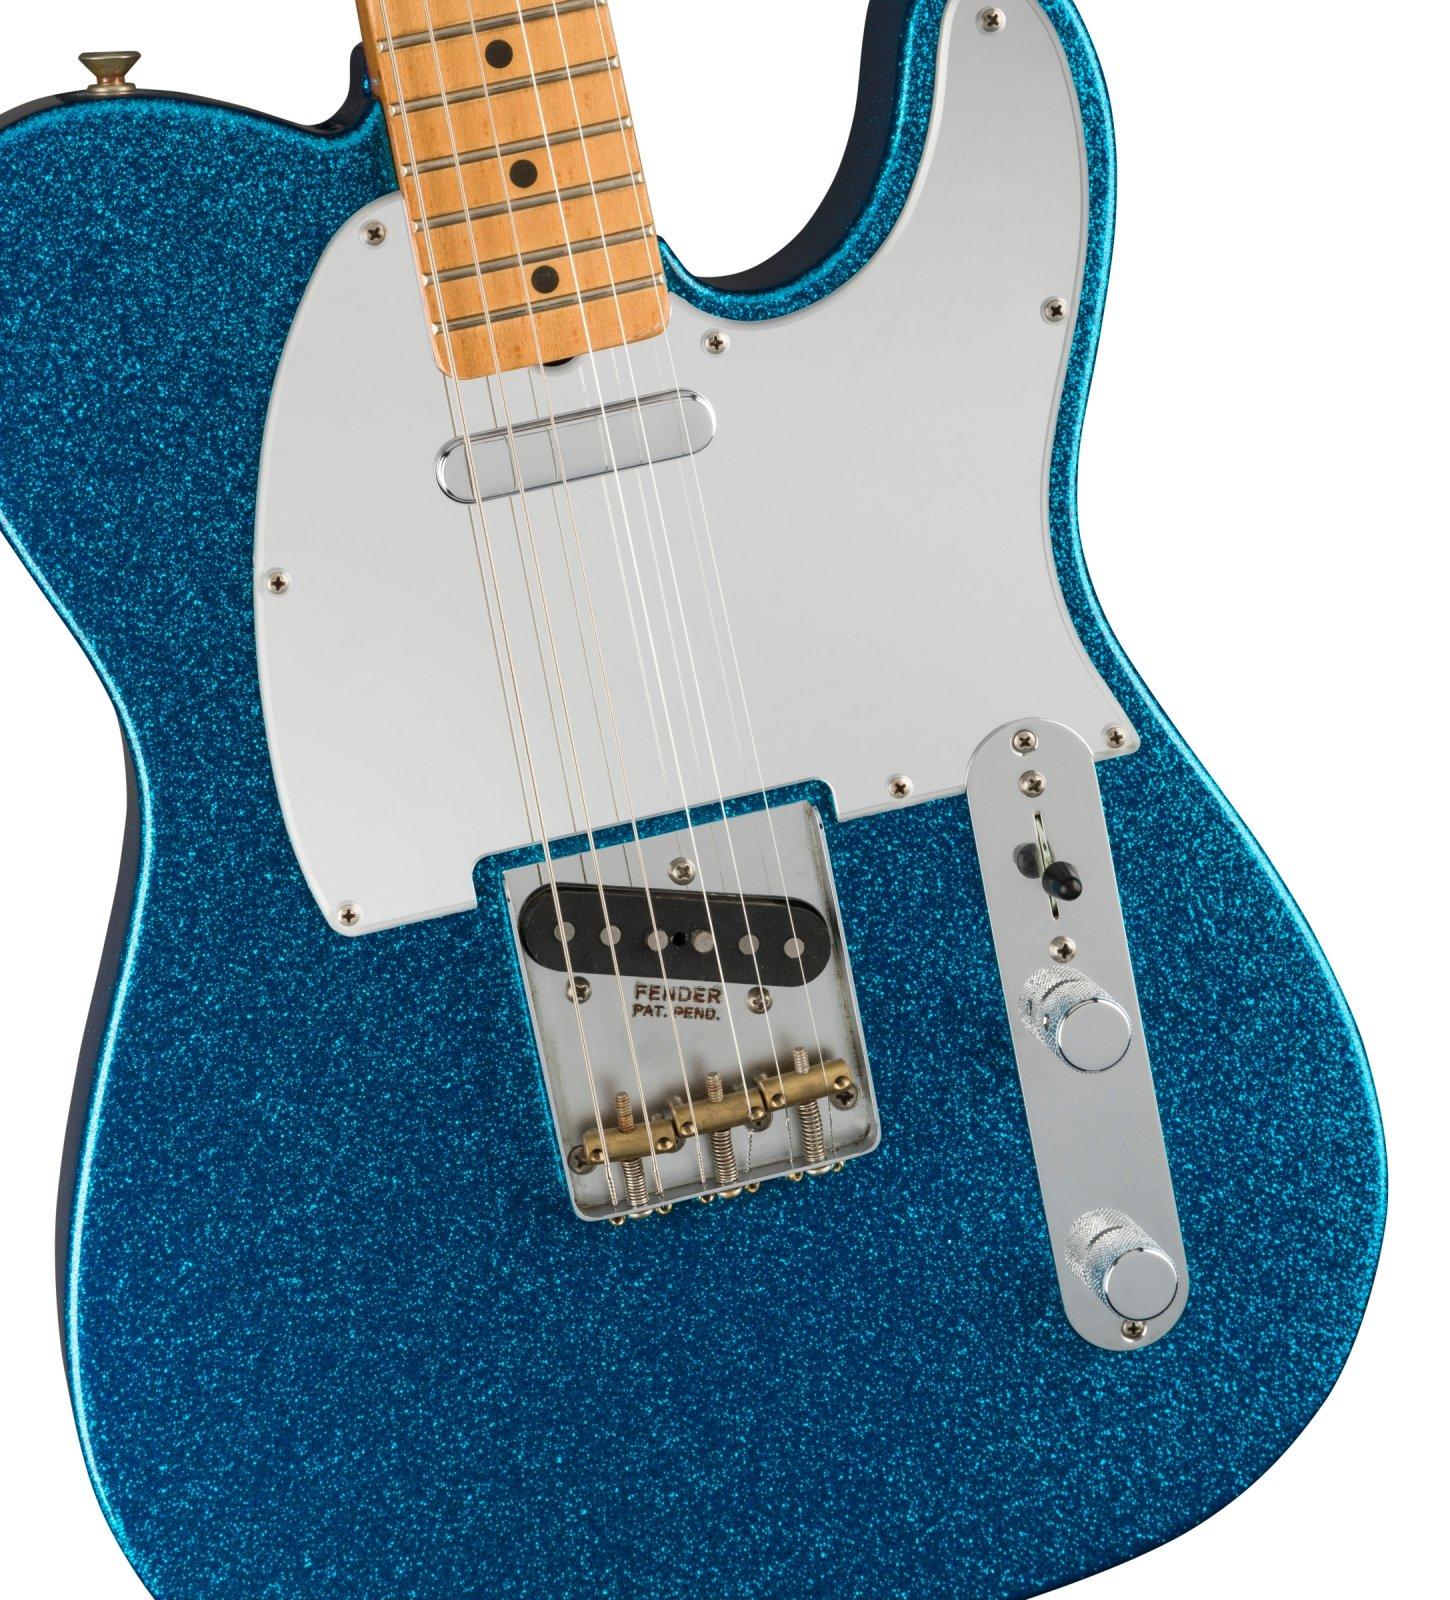 Fender J Mascis Telecaster -Bottle Rocket Blue Flake